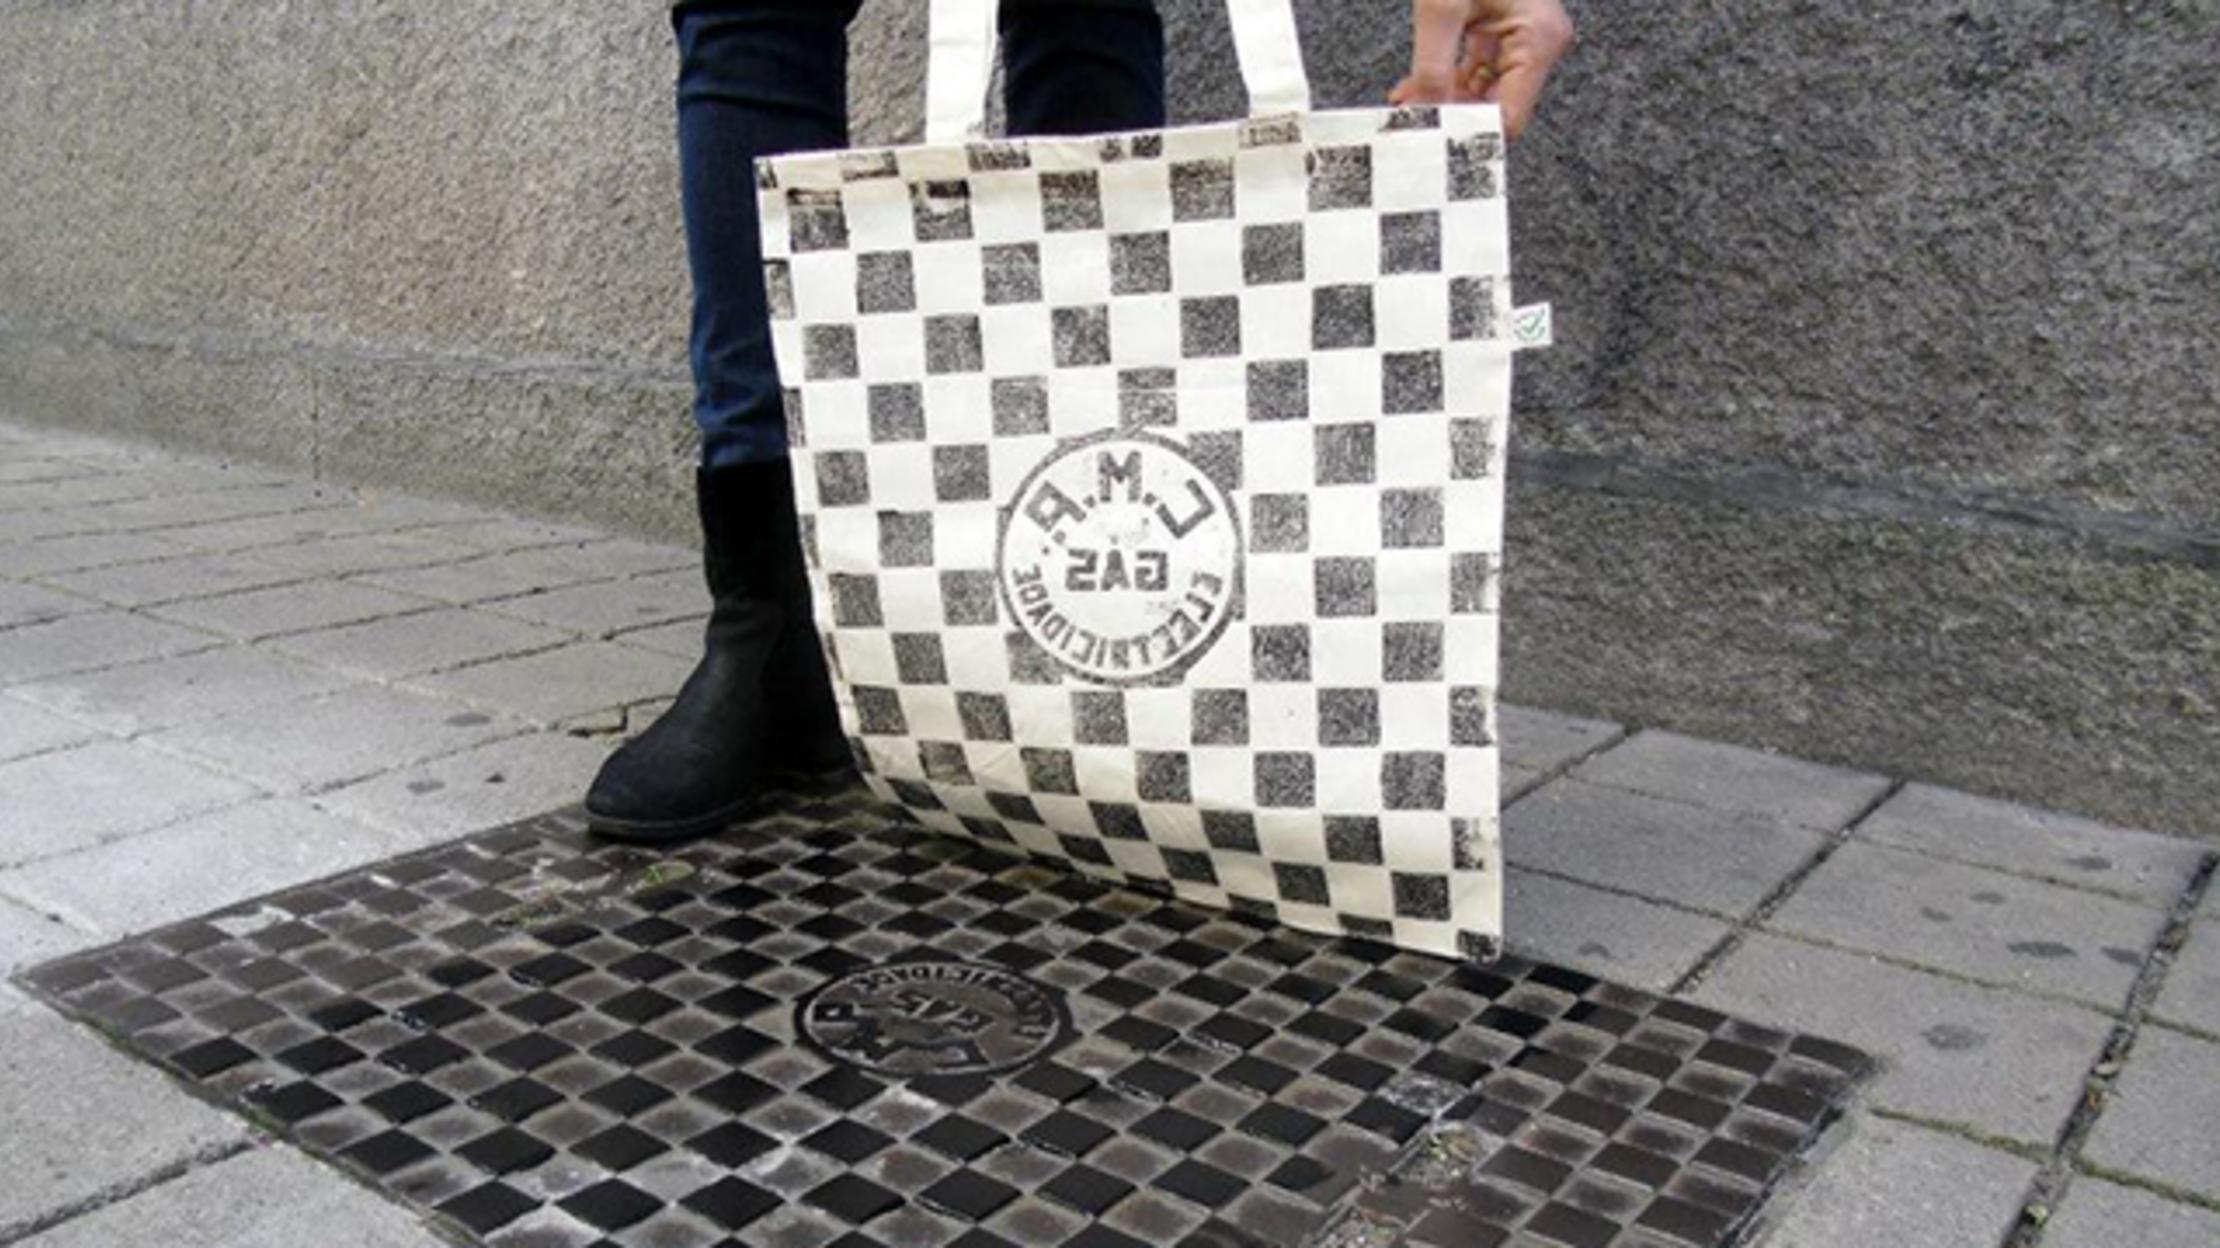 c782c638 Berlin Artists Create Graphic Designs From Public Street Fixtures ...